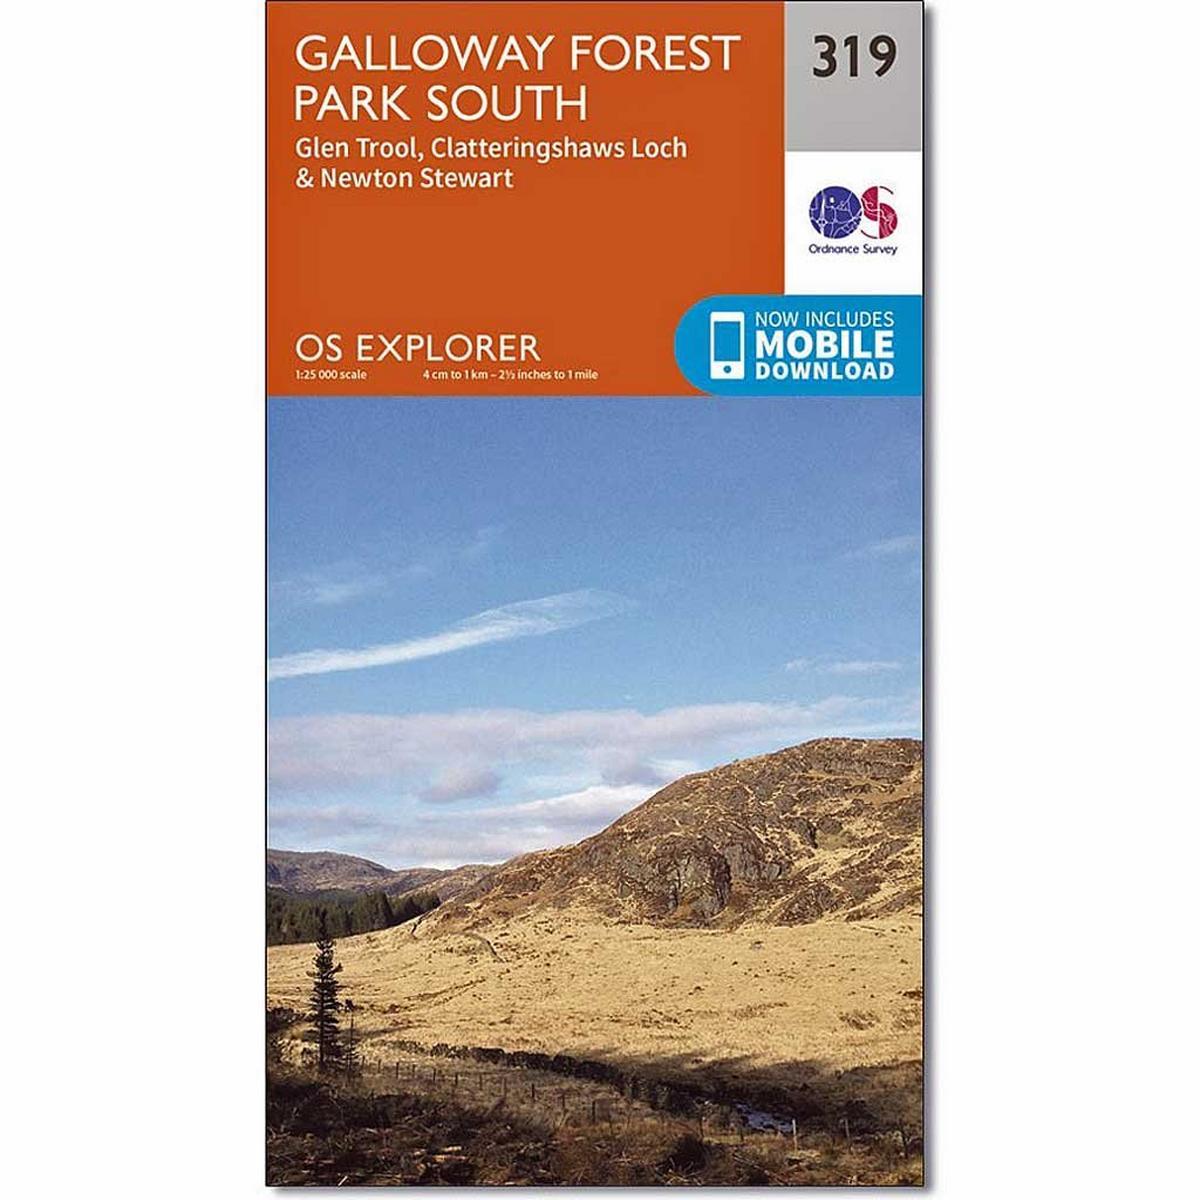 Ordnance Survey OS Explorer Map 319 Galloway Forest Park South